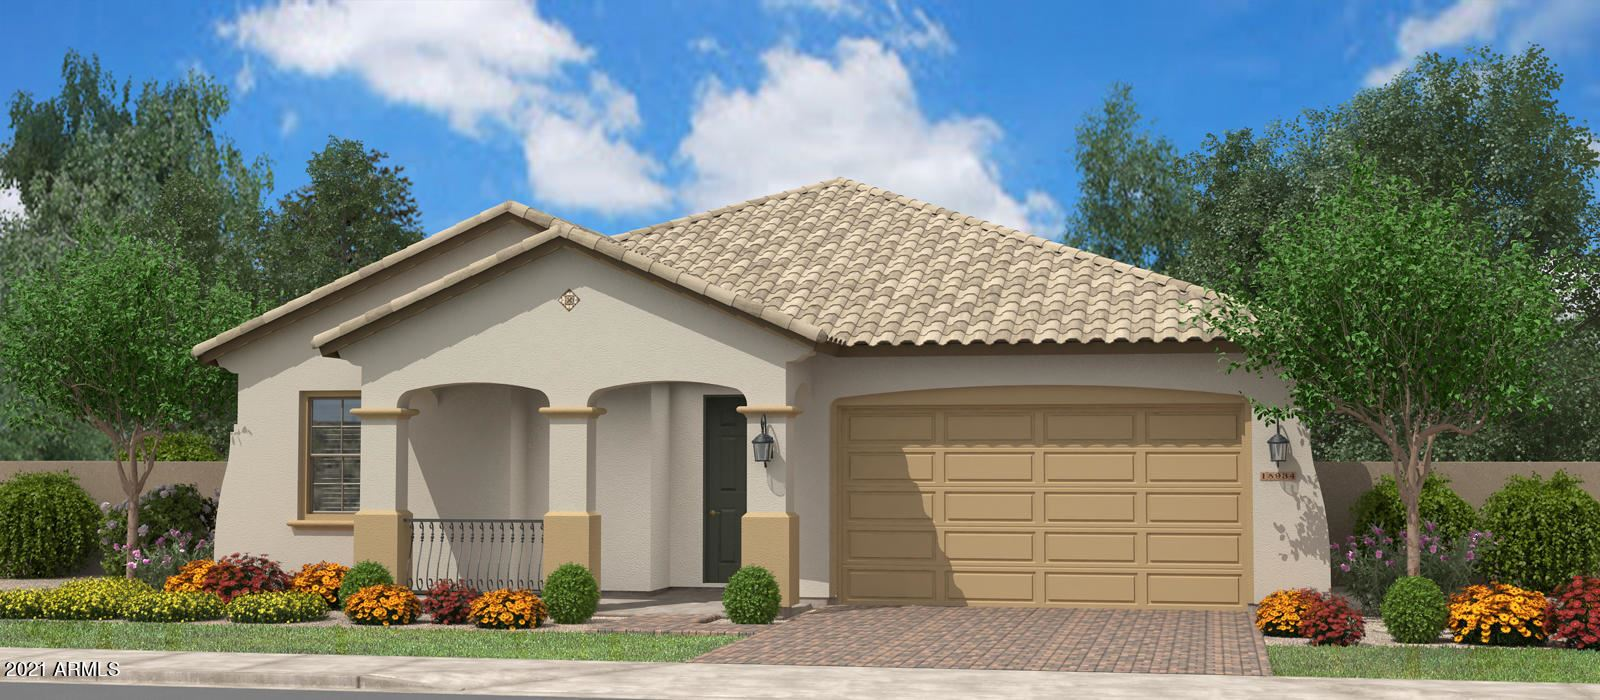 Photo for 41711 W Cielo Lane, Maricopa, AZ 85138 (MLS # 6180067)